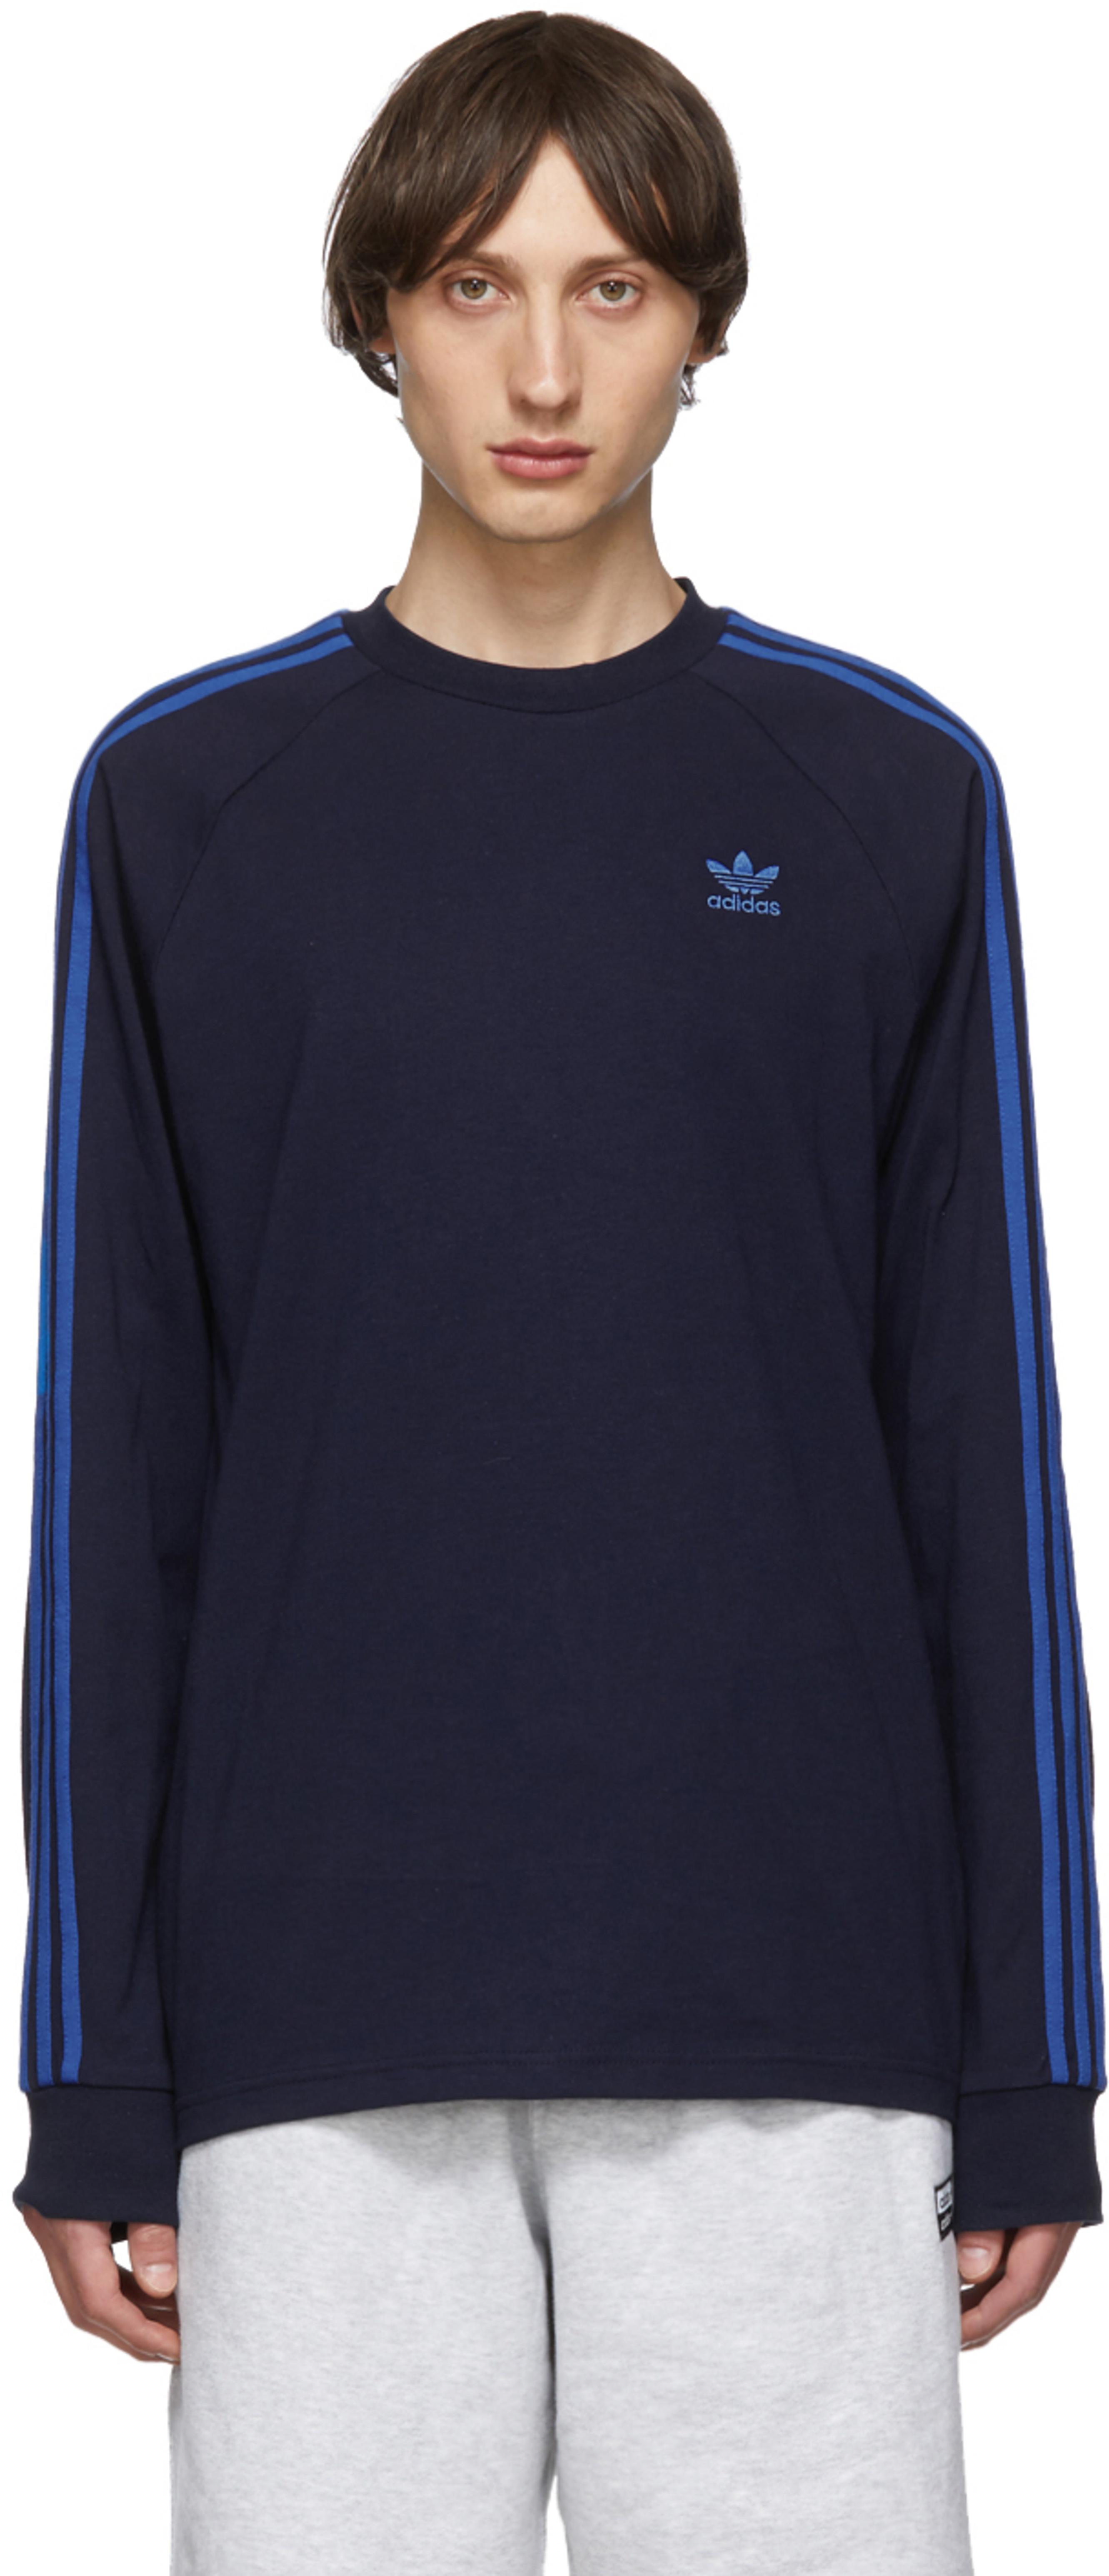 5514a628710588 Adidas Originals for Men FW19 Collection | SSENSE